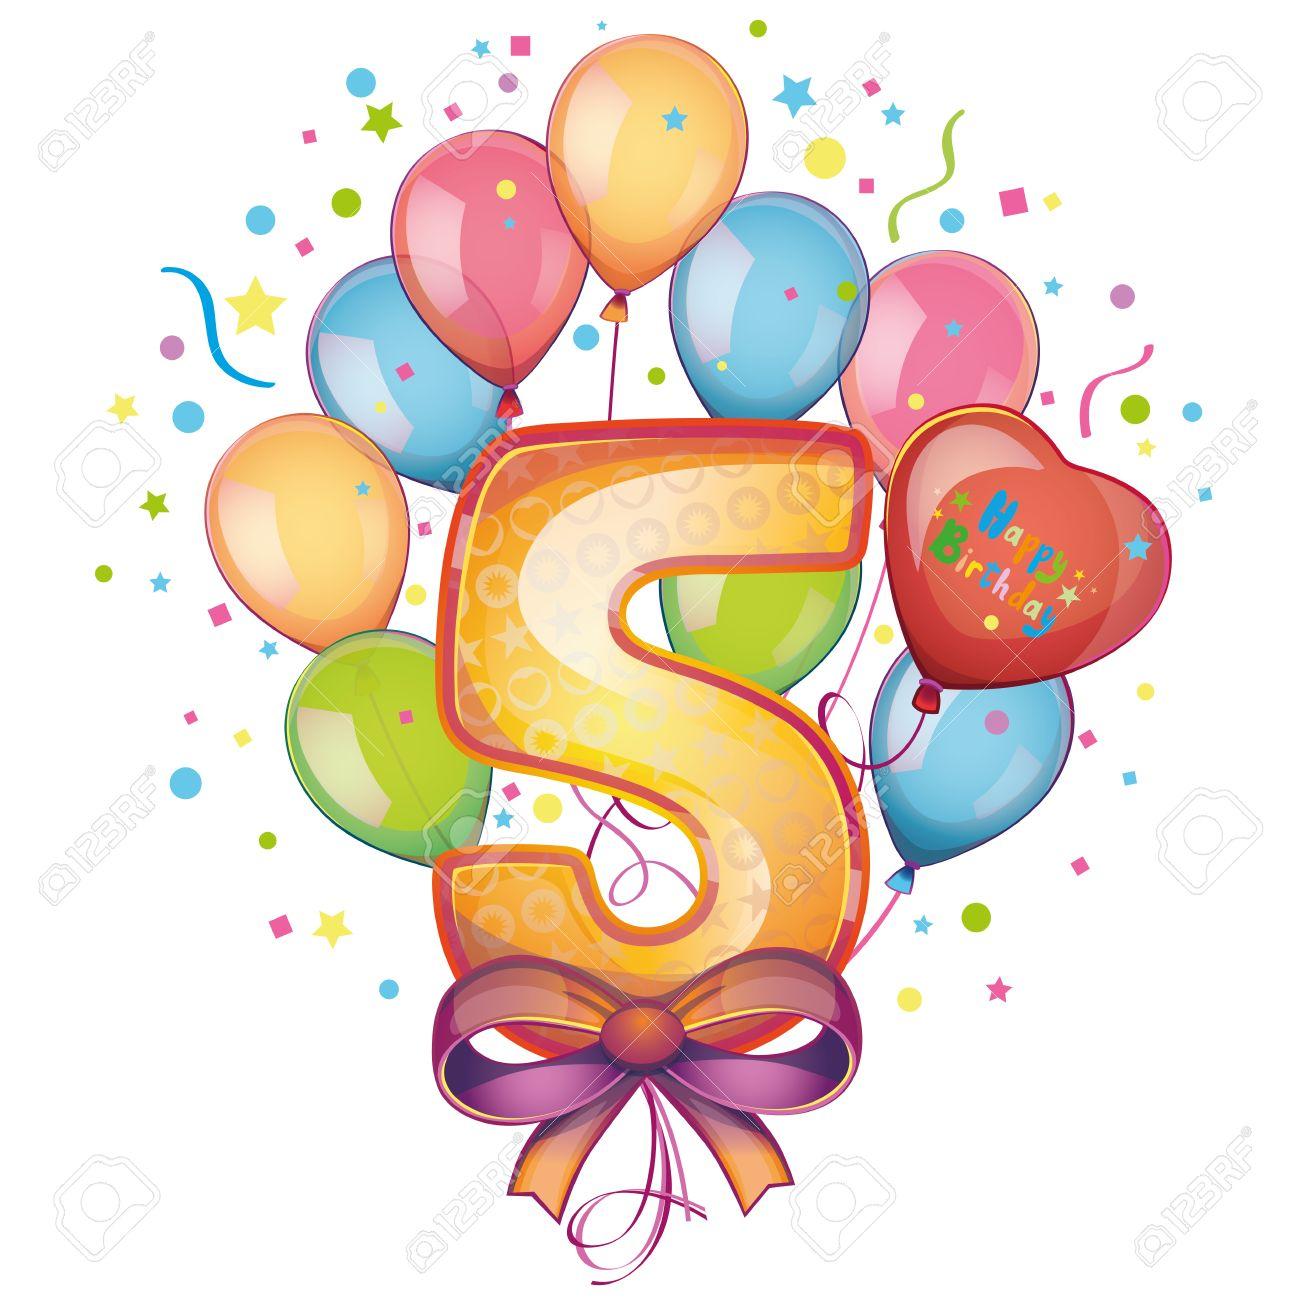 5 Happy Birthday balloons - 22406824